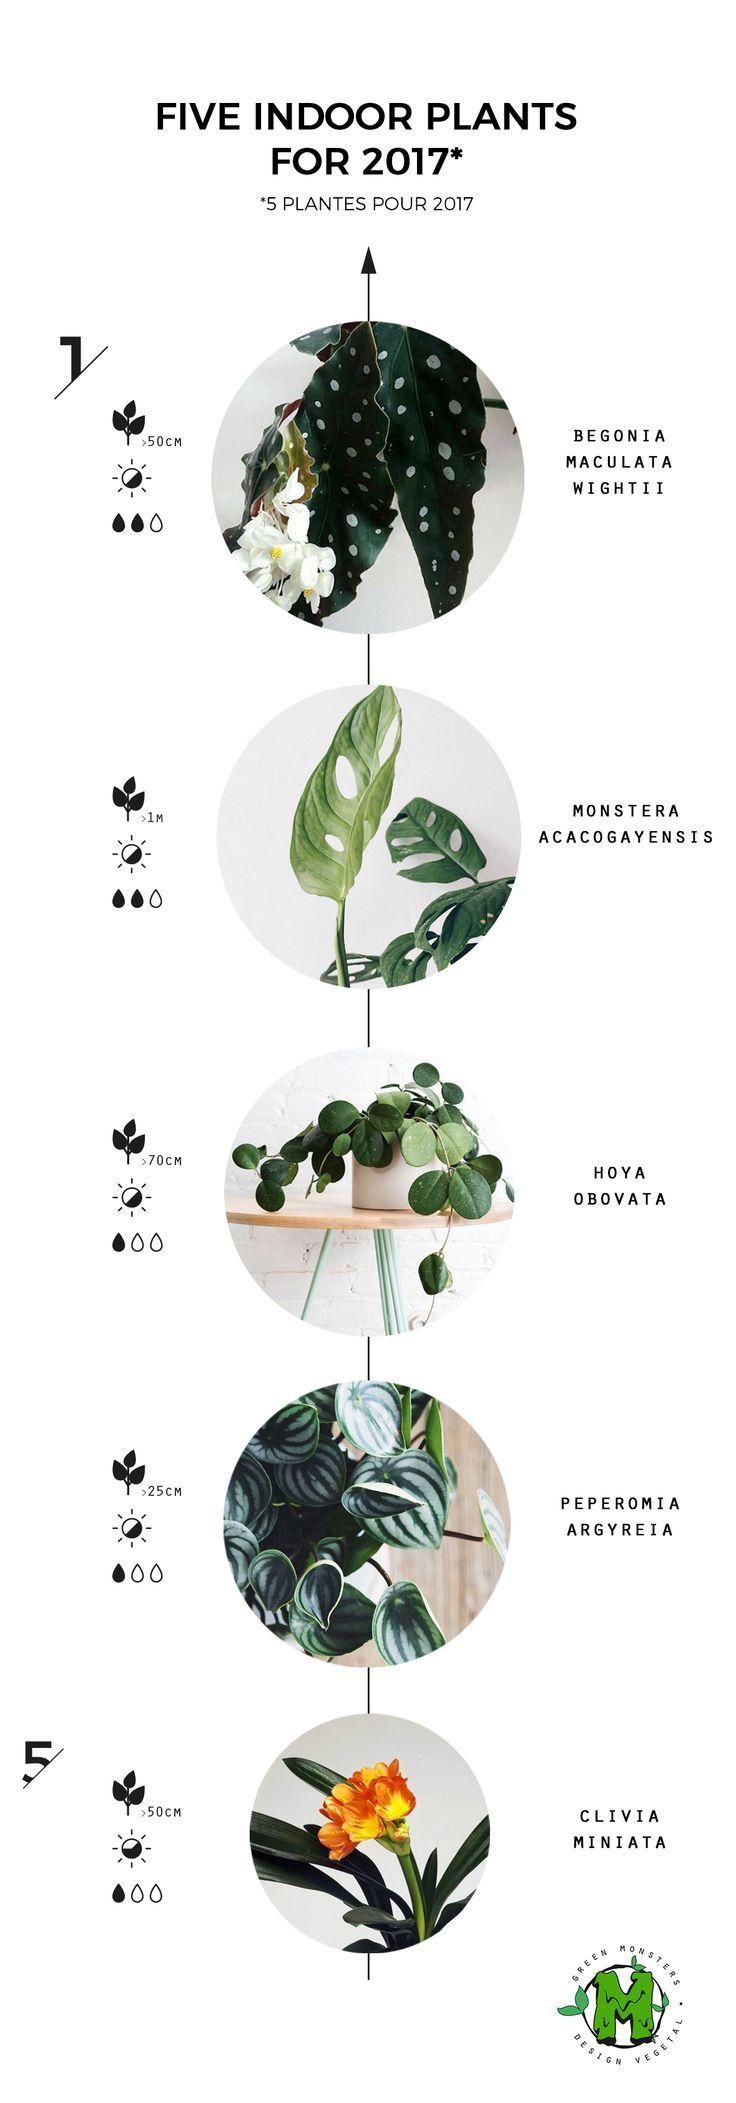 5 indoor plants  Begonia Maculata Wightii Monstera Acacogayensis Hoya Obovata Peperomia Agyreia Clivia Miniata